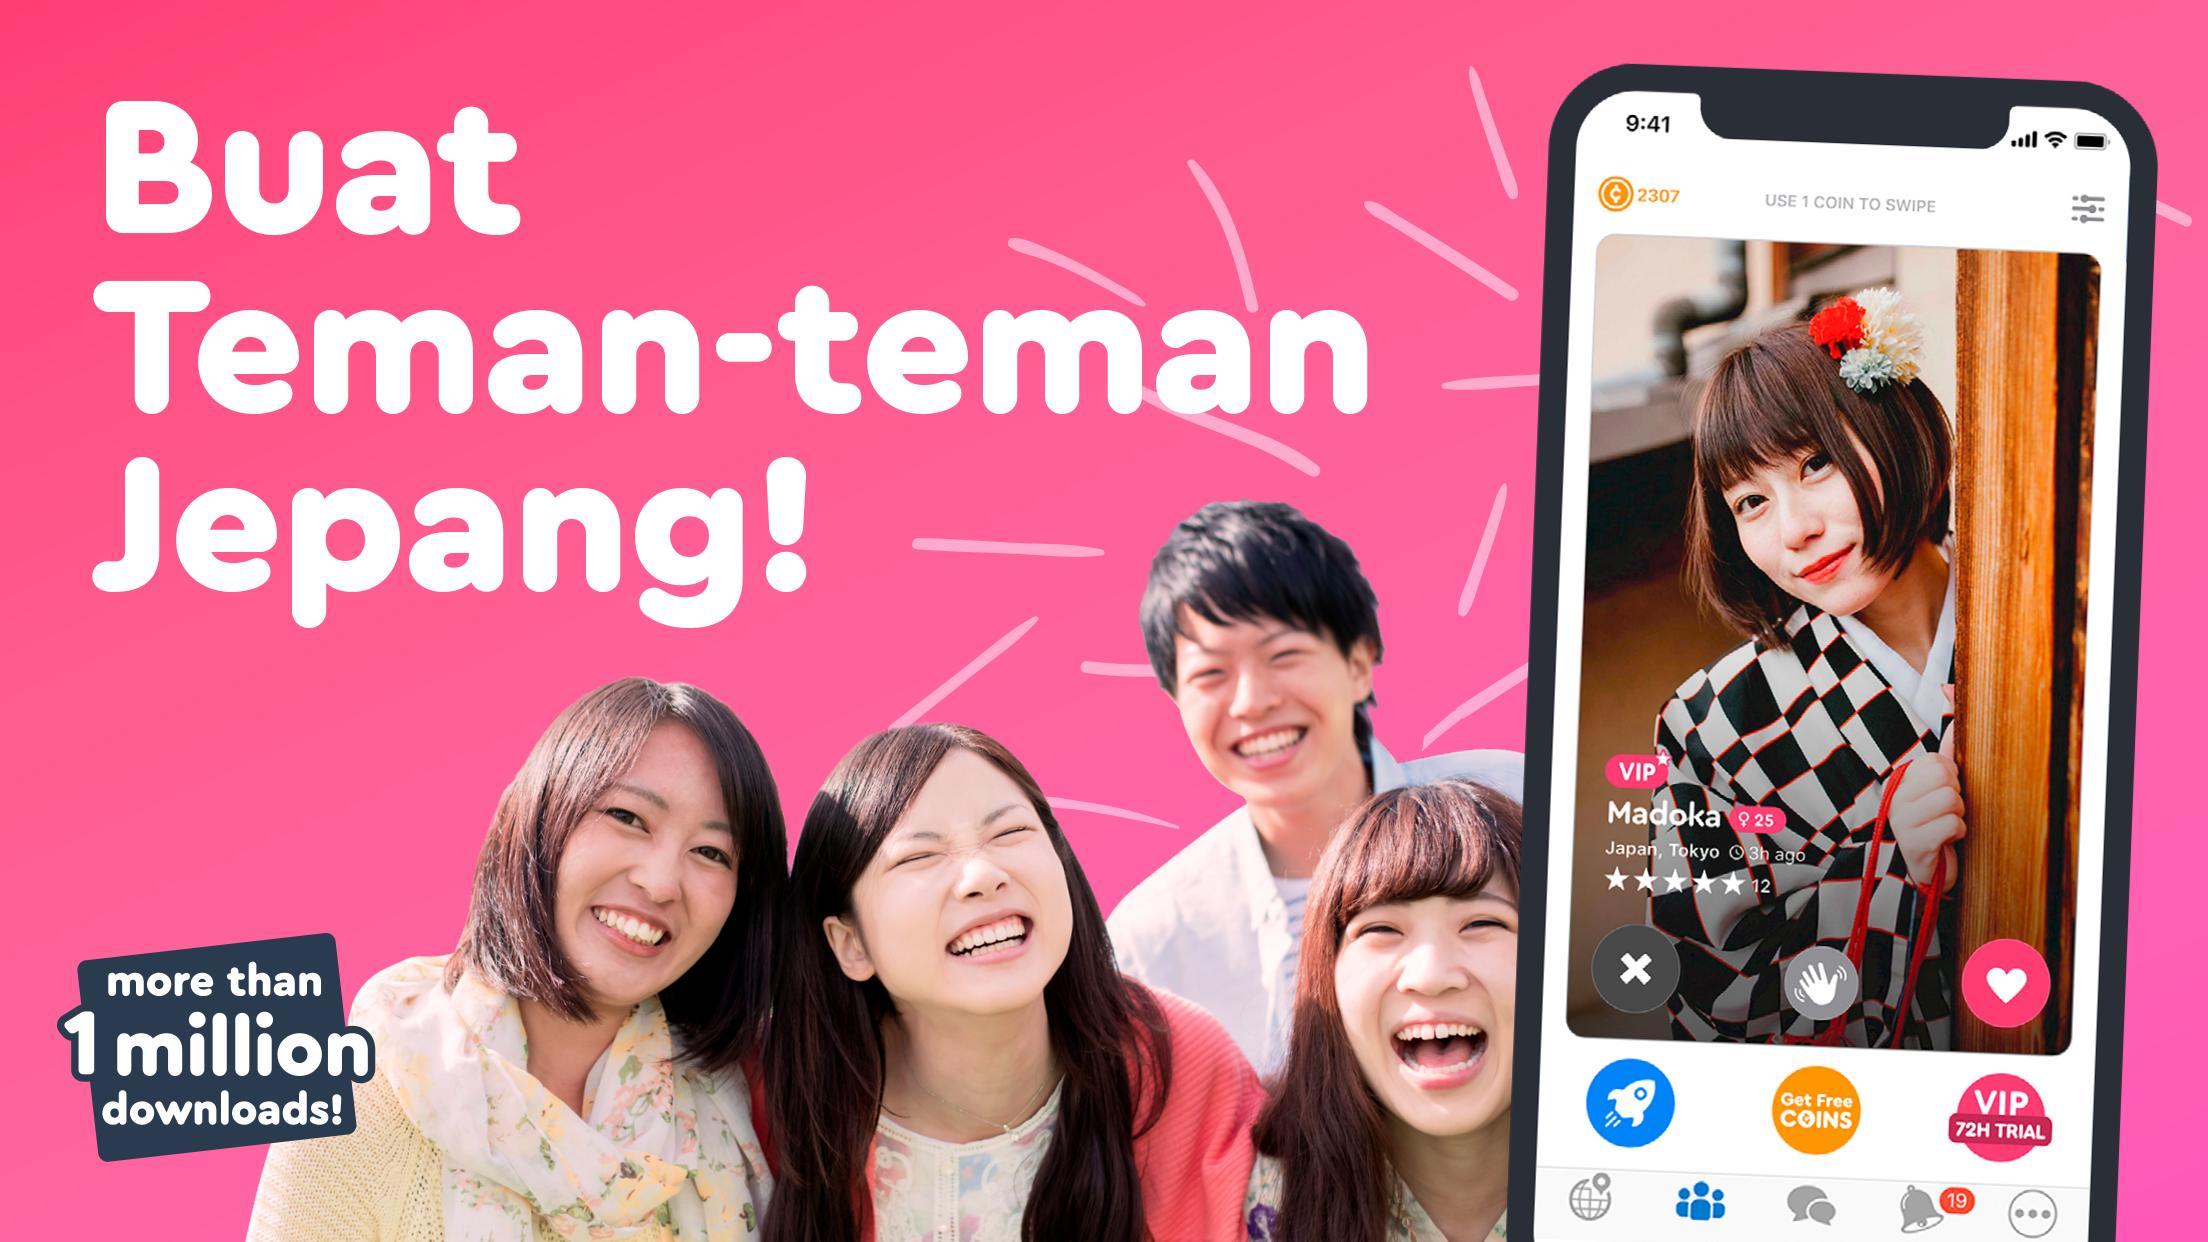 Chat jepang orang aplikasi dengan 8 Aplikasi